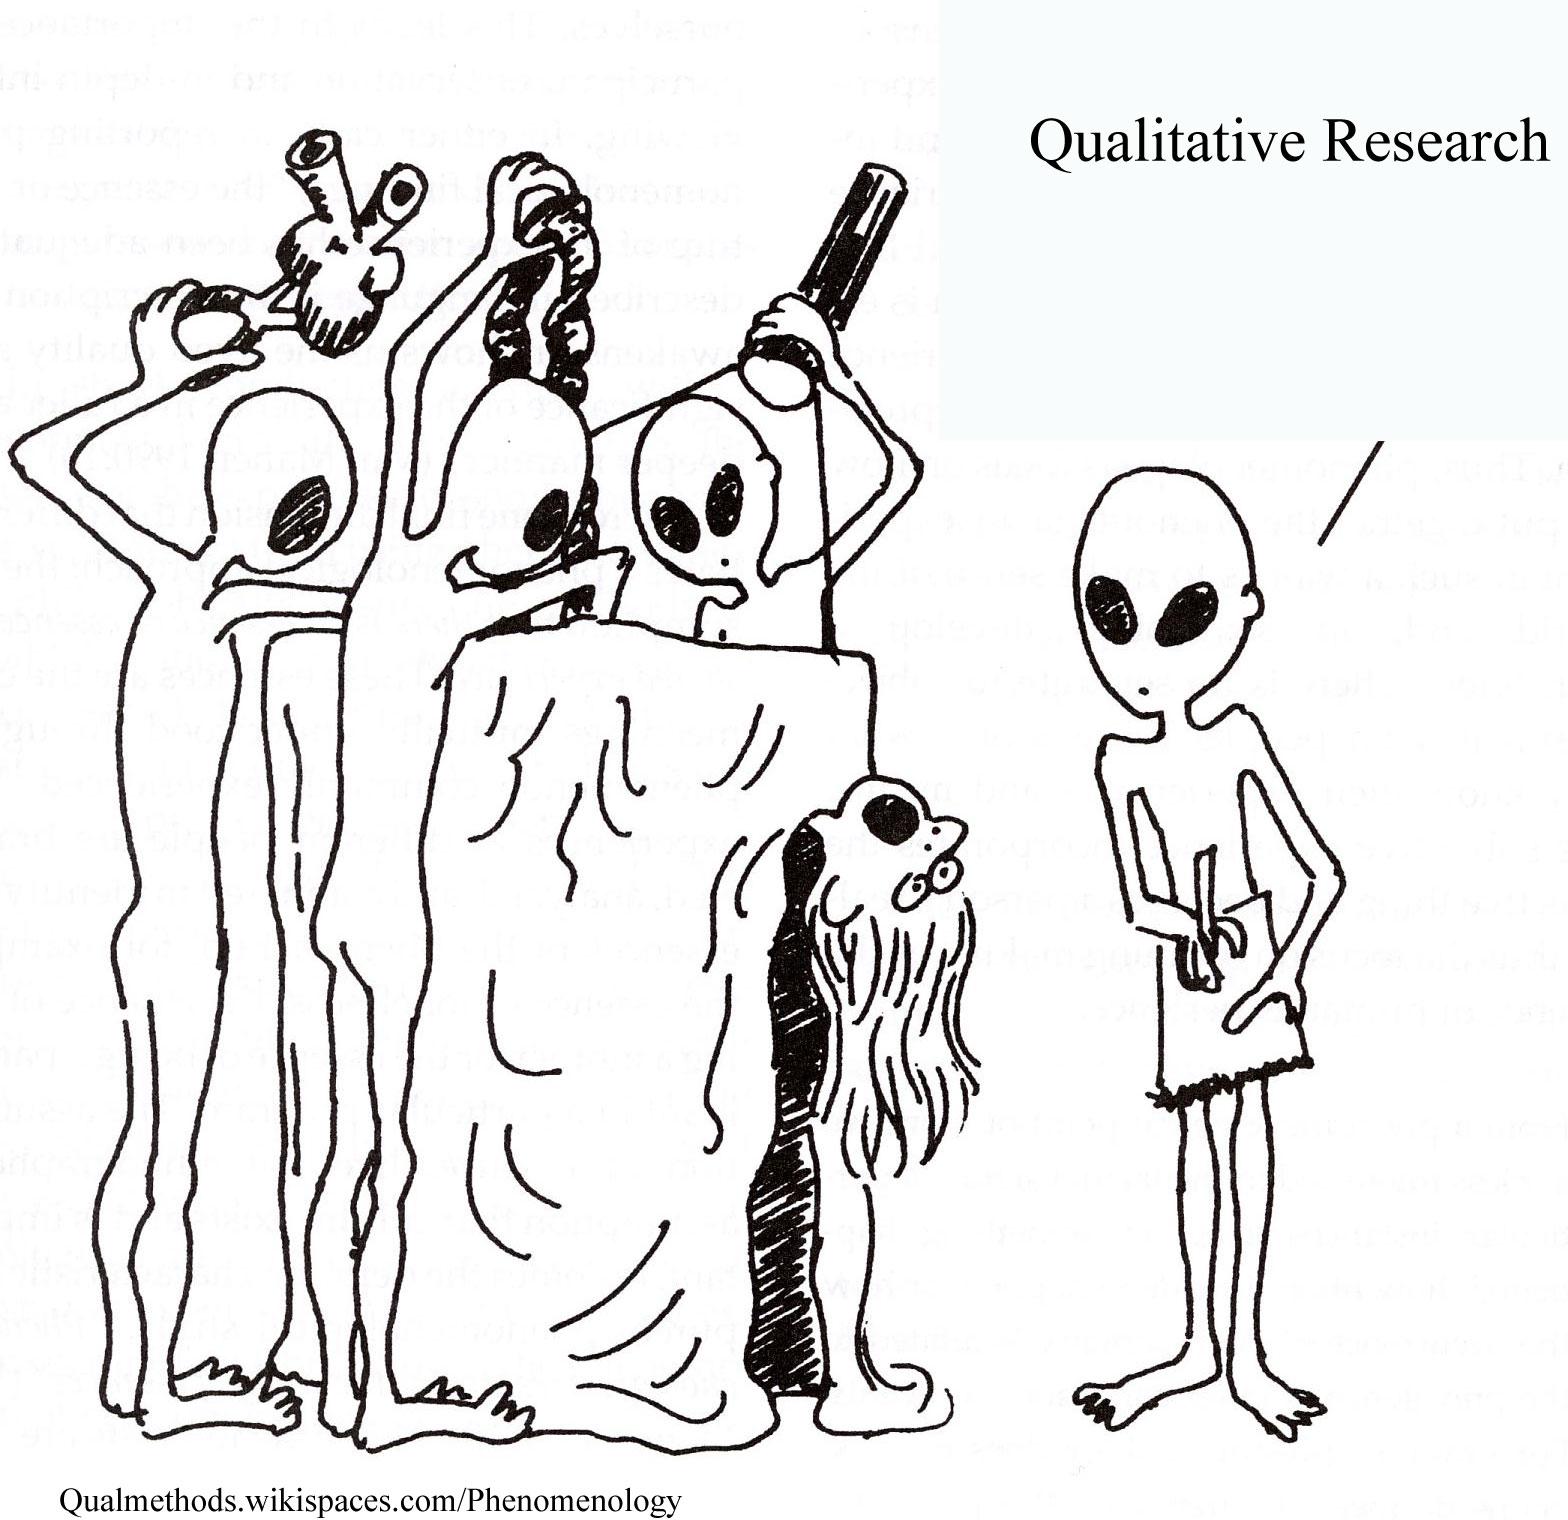 Dissertation using qualitative research methods